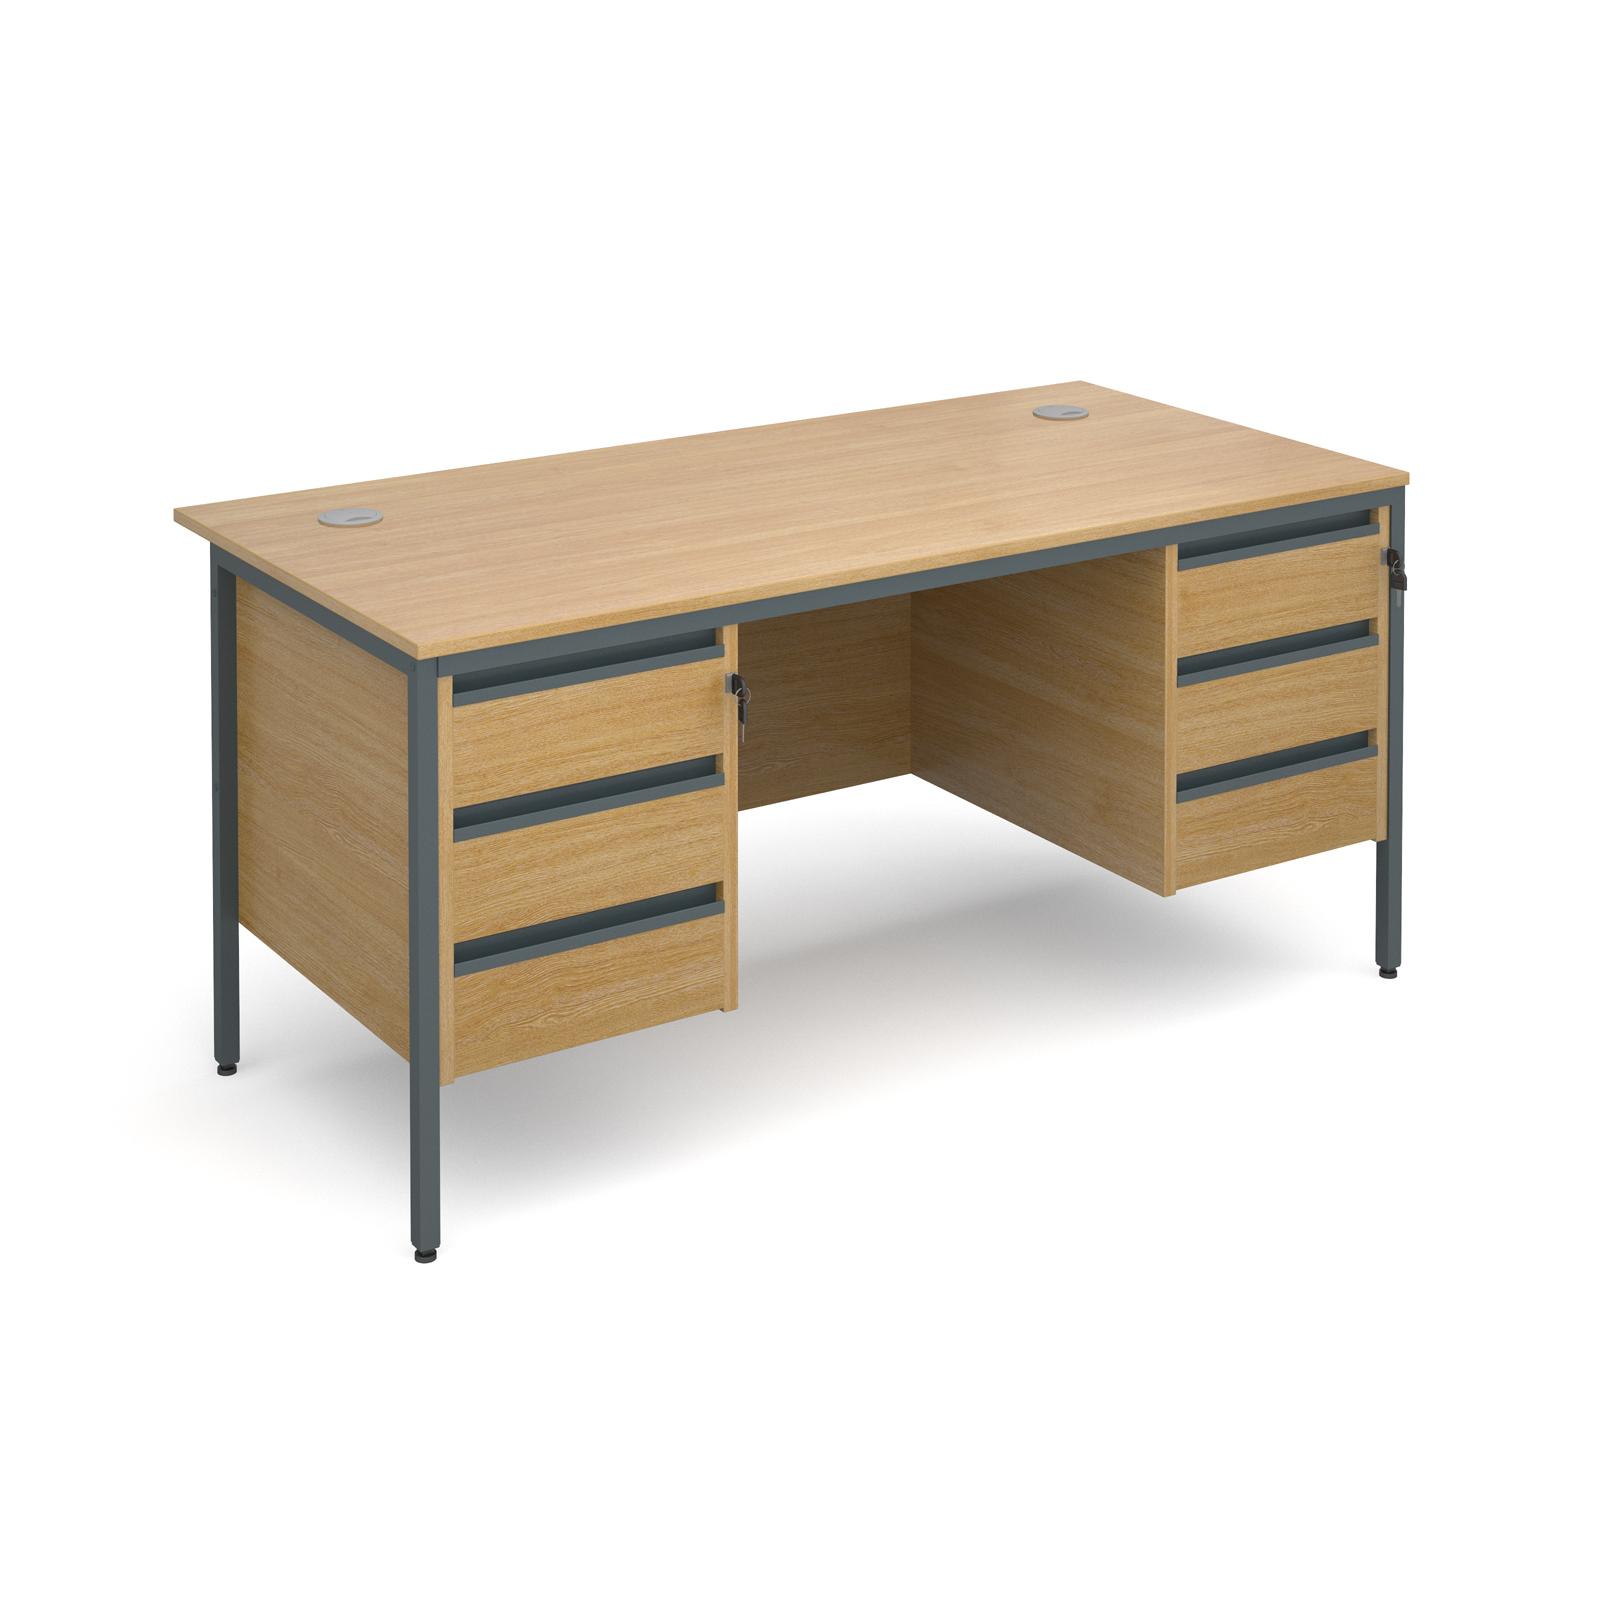 Maestro H frame straight desk with 3 and 3 drawer pedestals 1532mm - oak